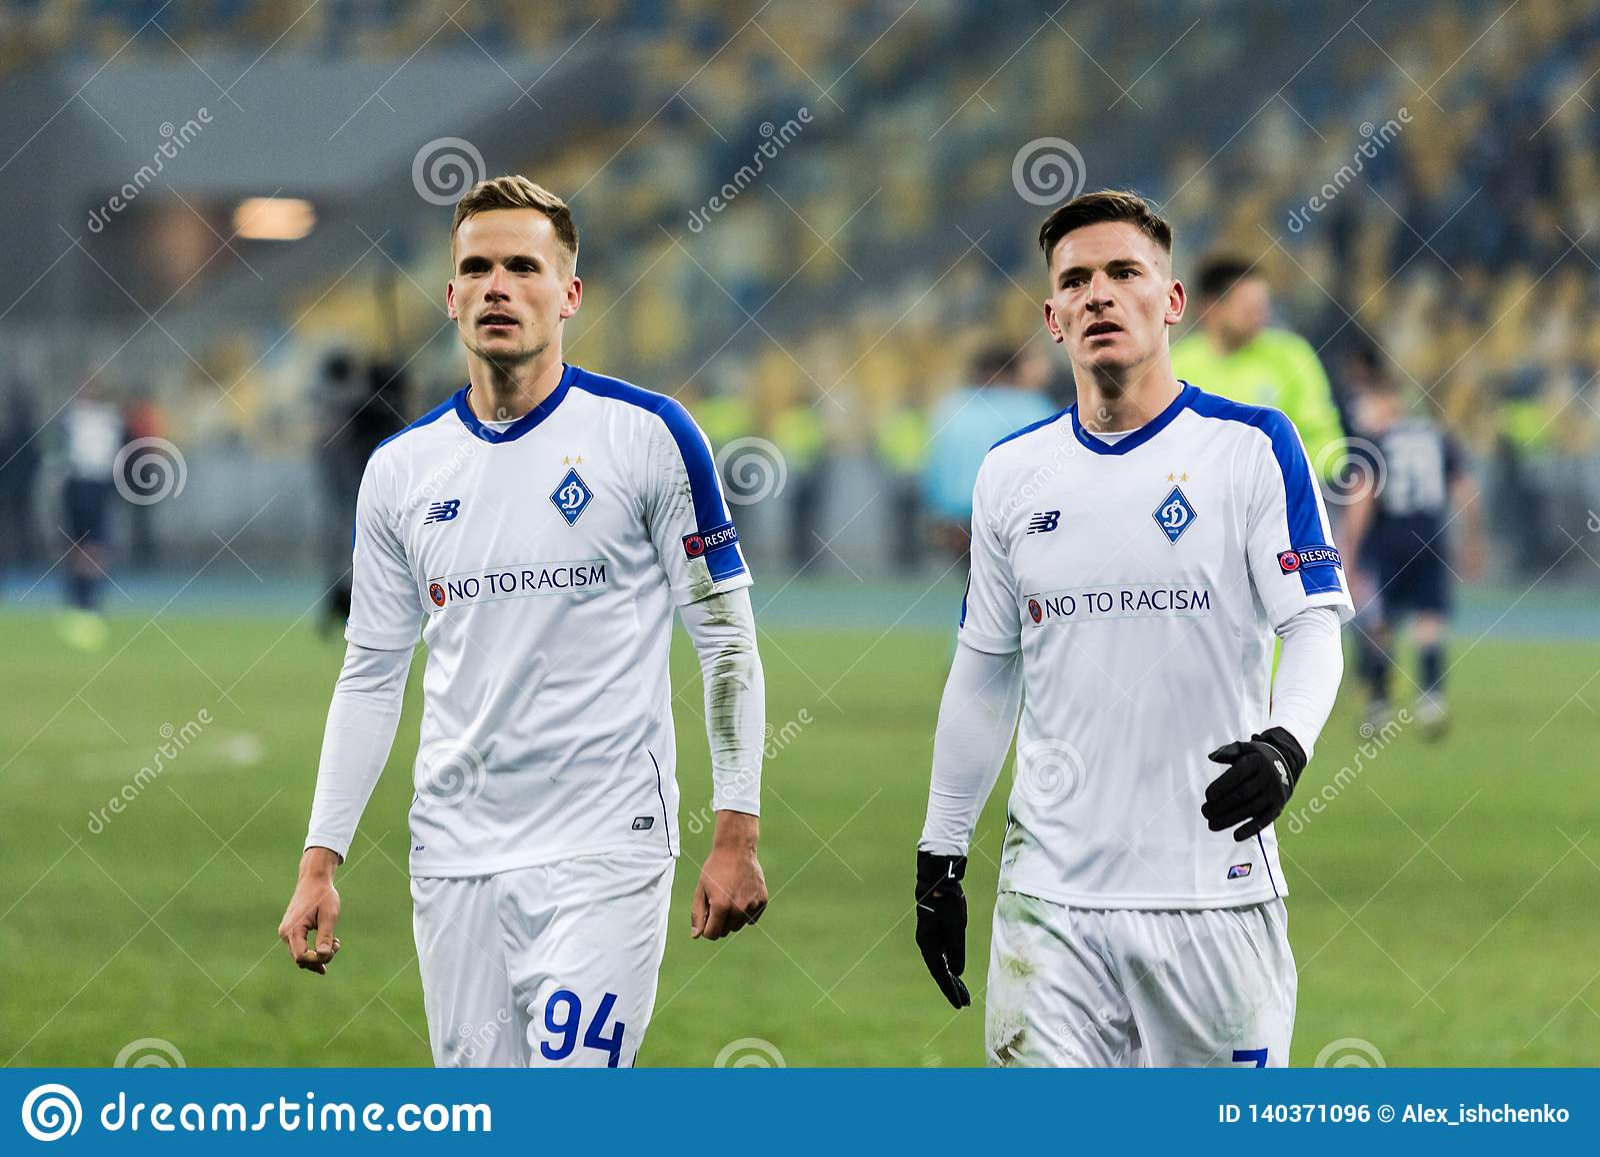 UEFA Europa League football match Dynamo Kyiv – Olympiakos FC, February 22, 2019